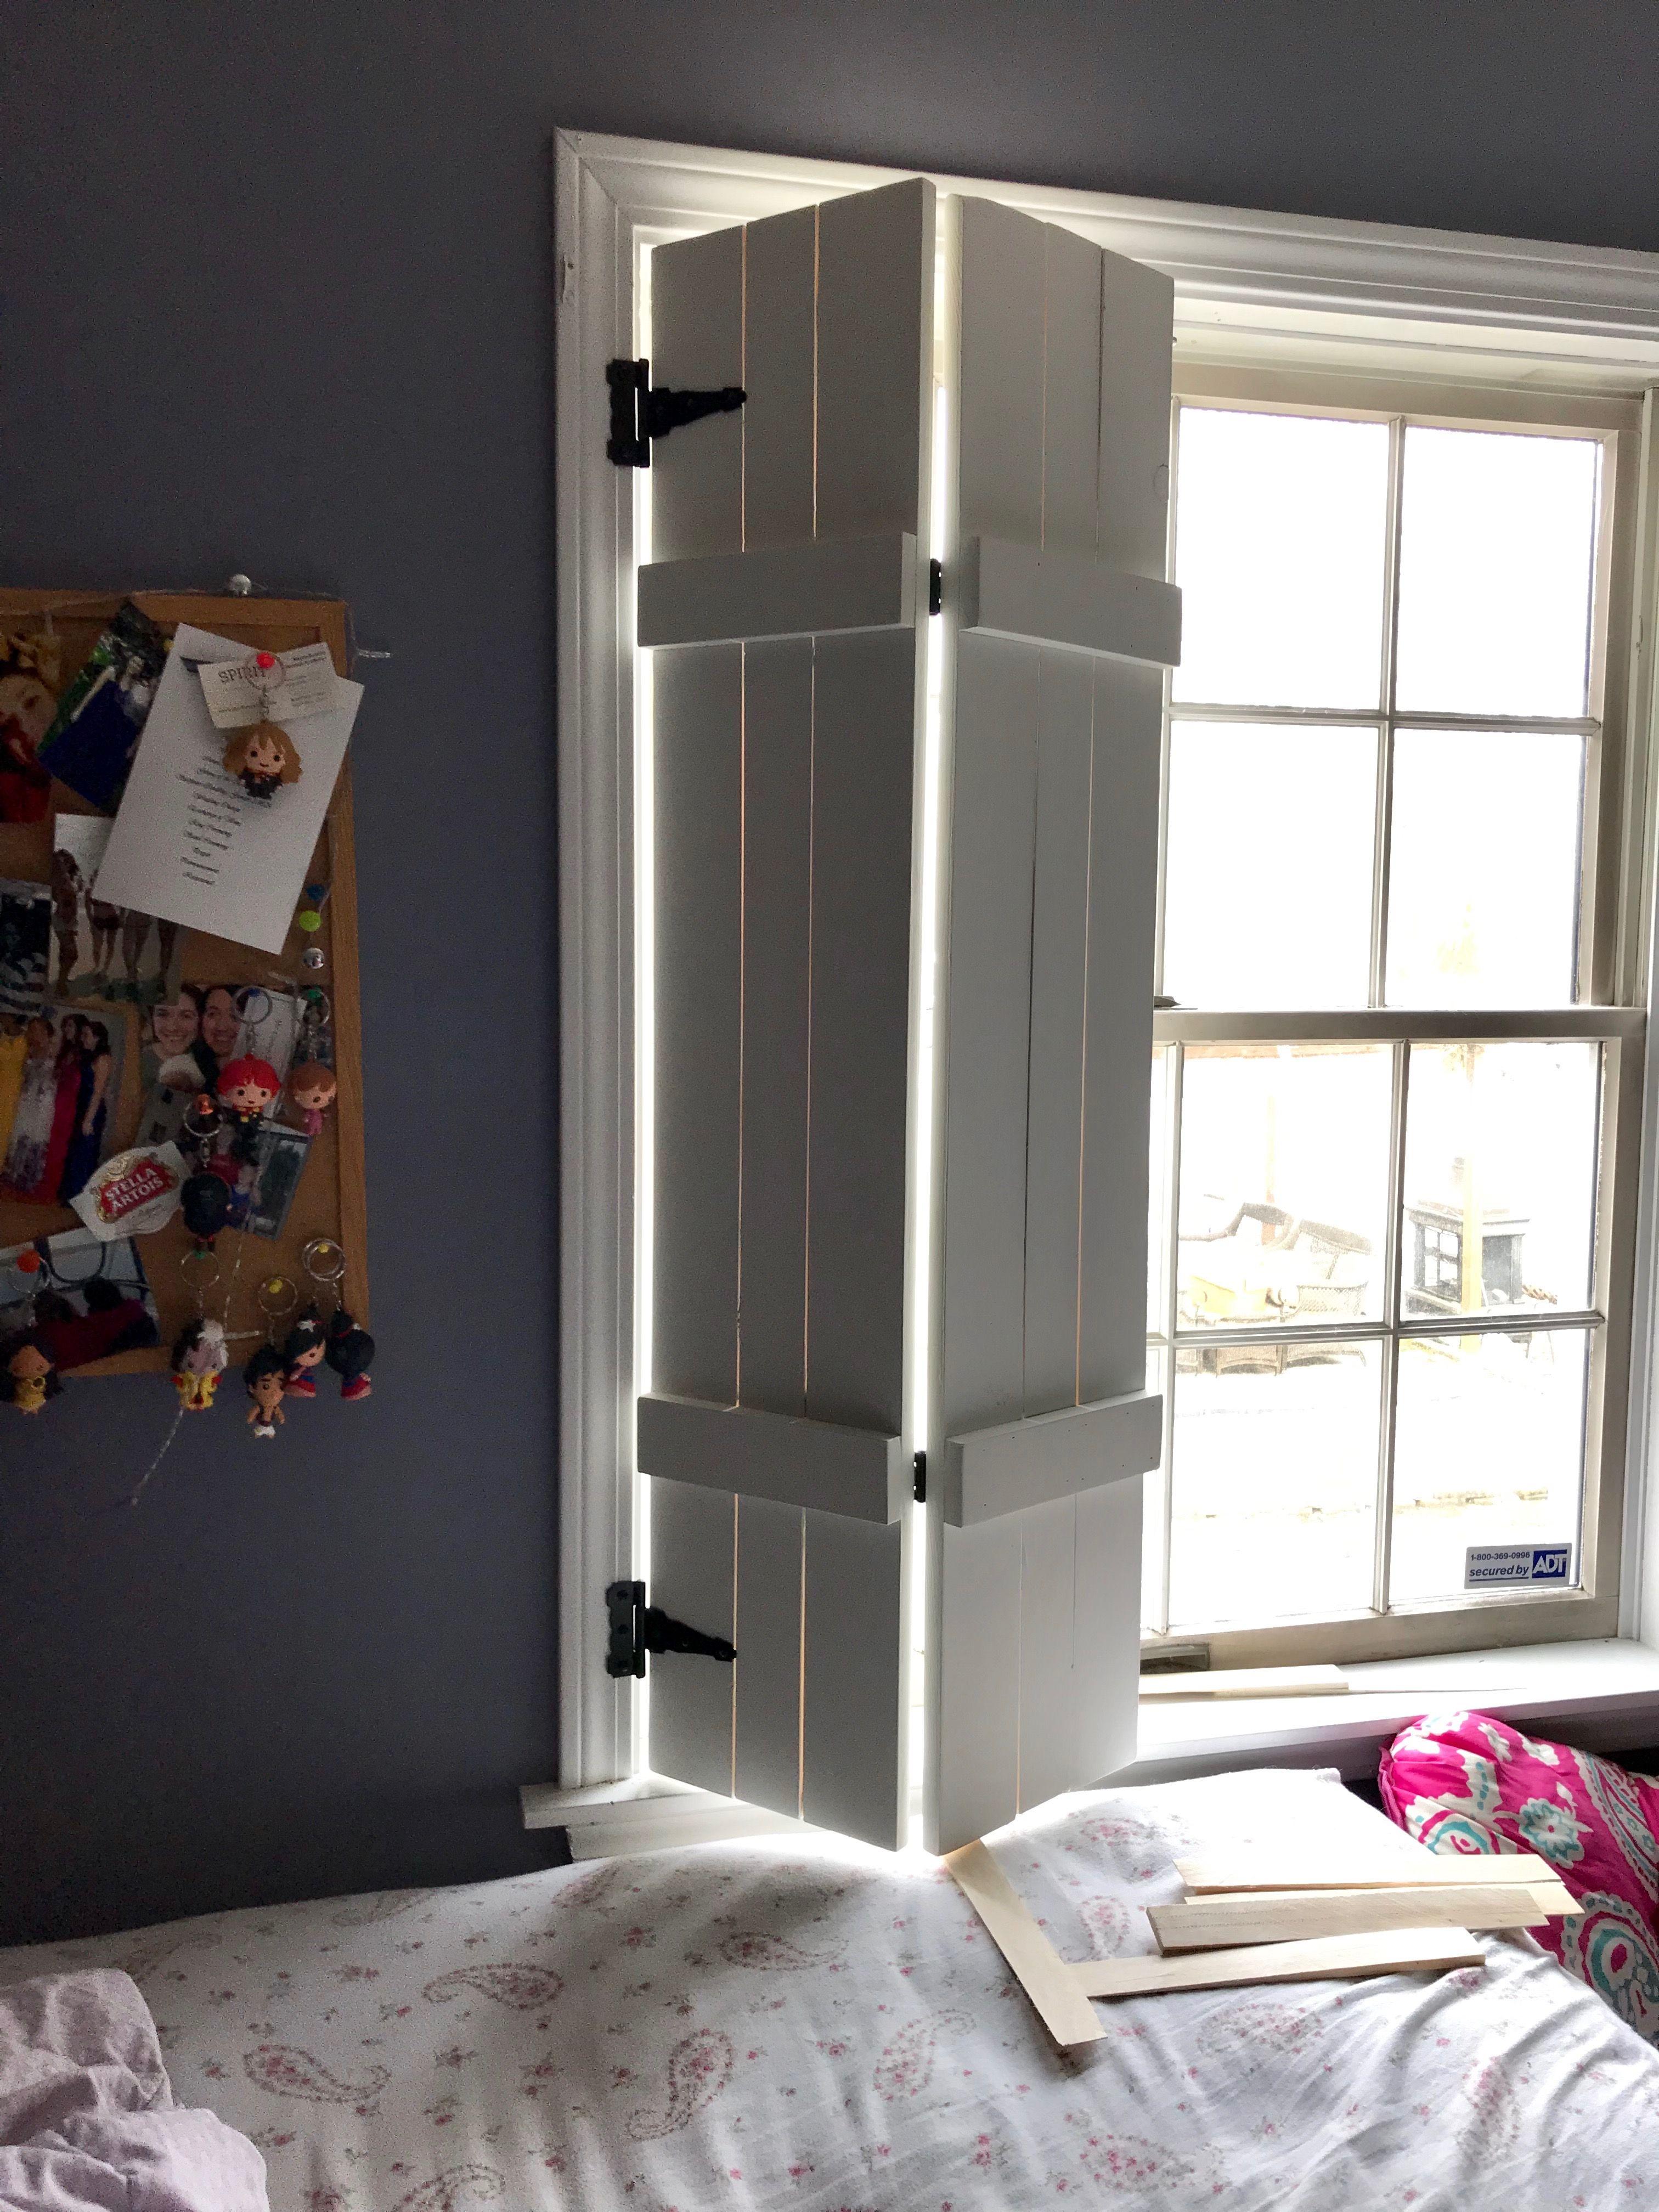 Diy farmhouse shutter indoor shutters shutters diy